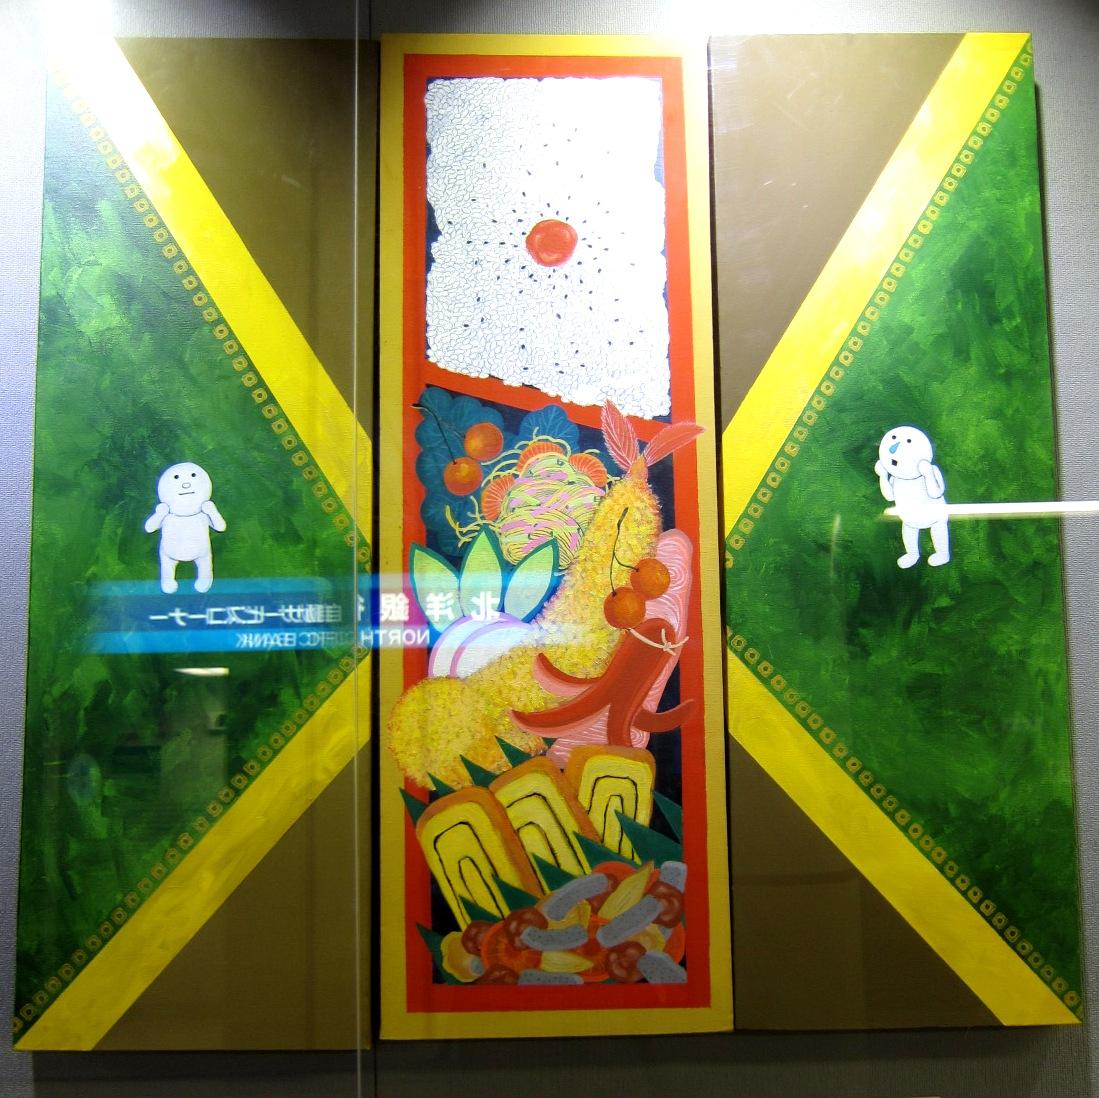 2216)「(YUKO個展)コトノハエマキinメトロギャラリ-」 円山公園駅メトロg. 9月4日(水)~9月26日(木) _f0126829_093621.jpg